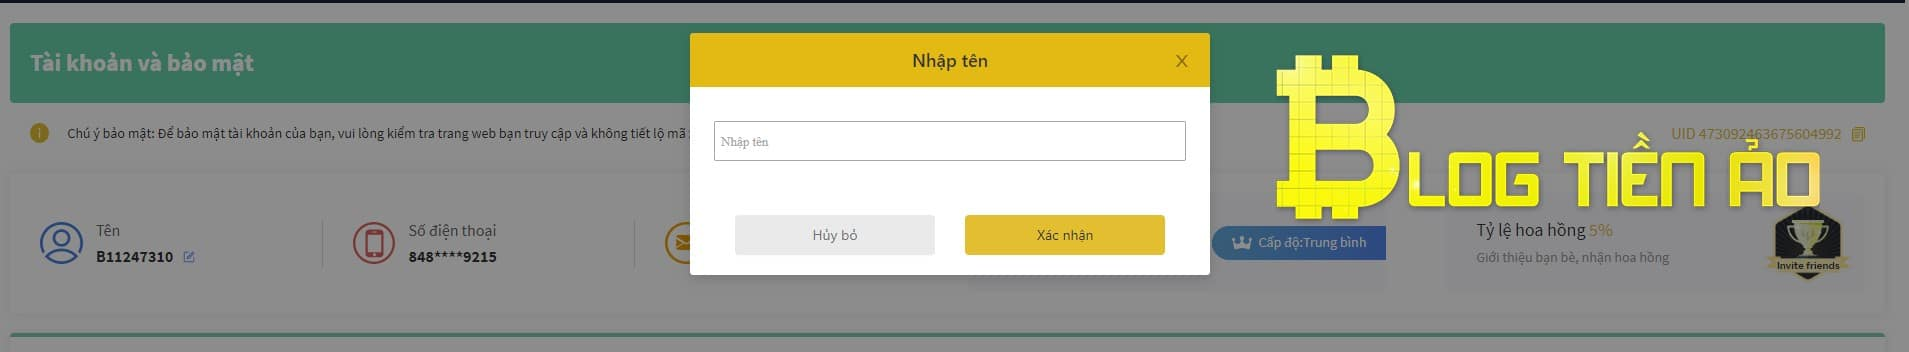 Modify the username to receive 1 USDT